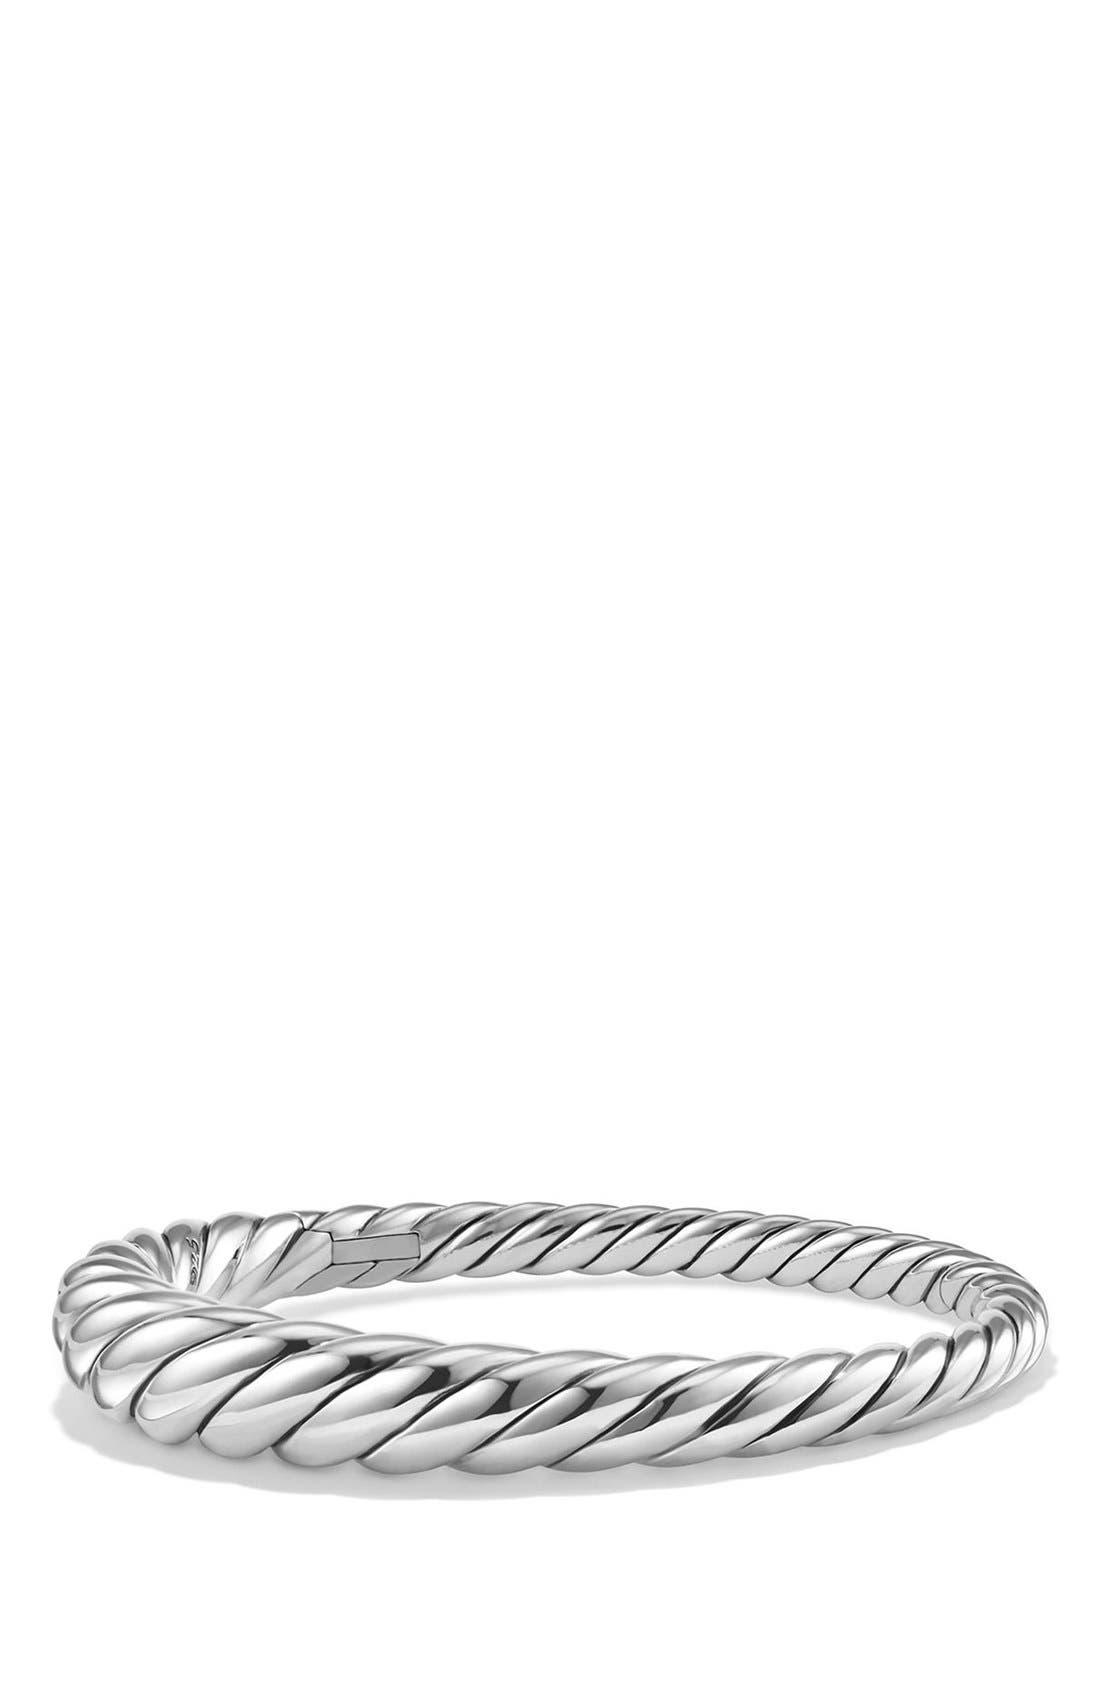 Main Image - David Yurman 'Pure Form' Small Cable Bracelet